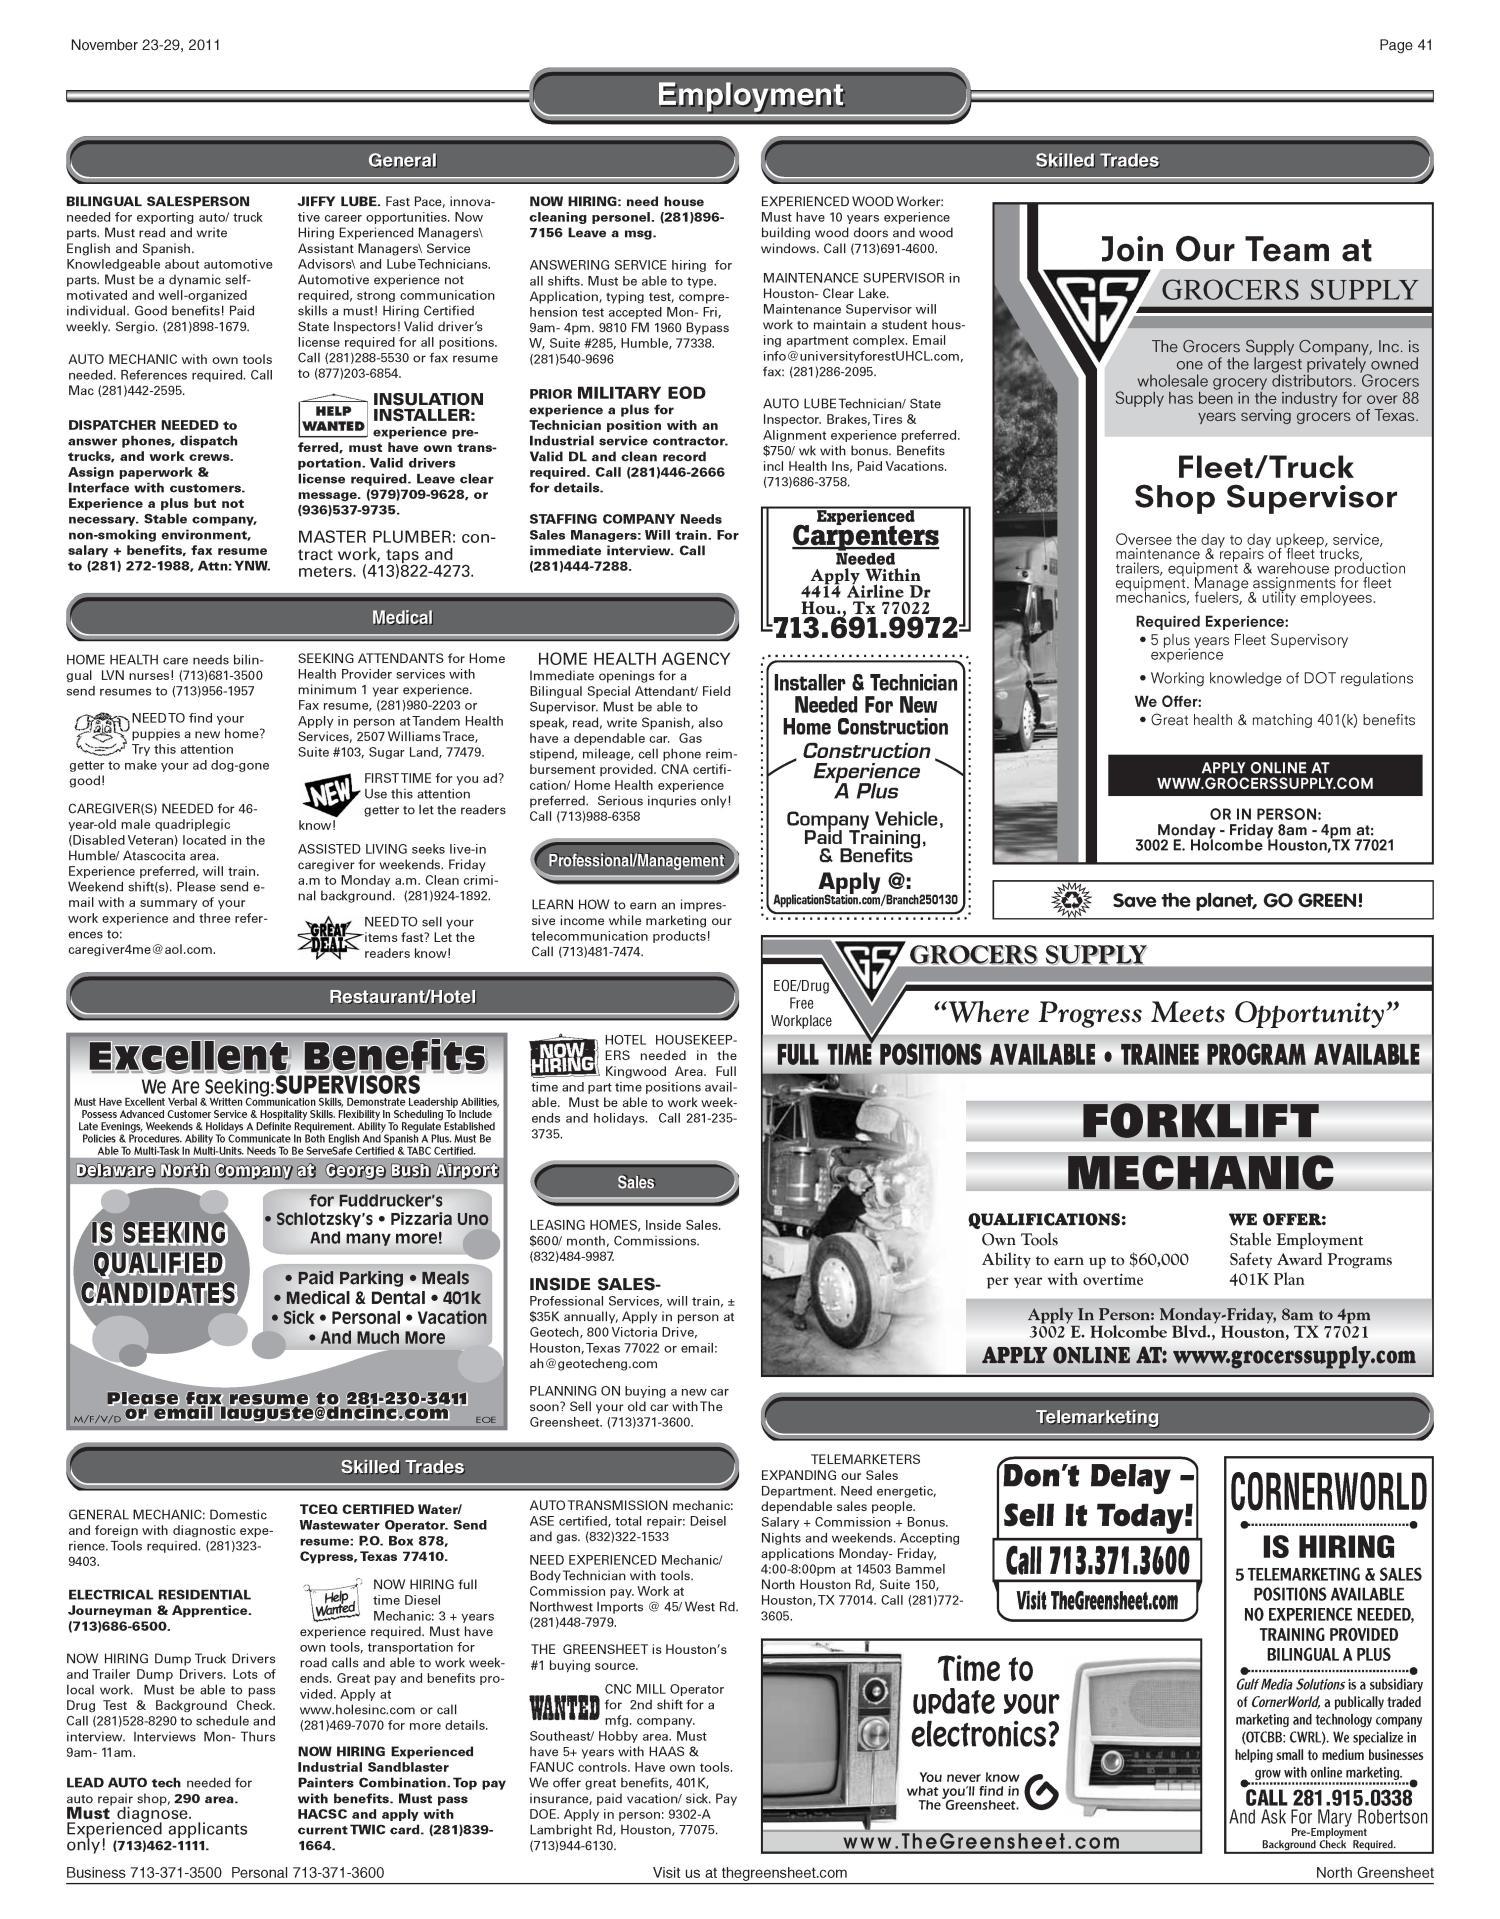 The Greensheet Houston Tex Vol 42 No 509 Ed 1 Thursday